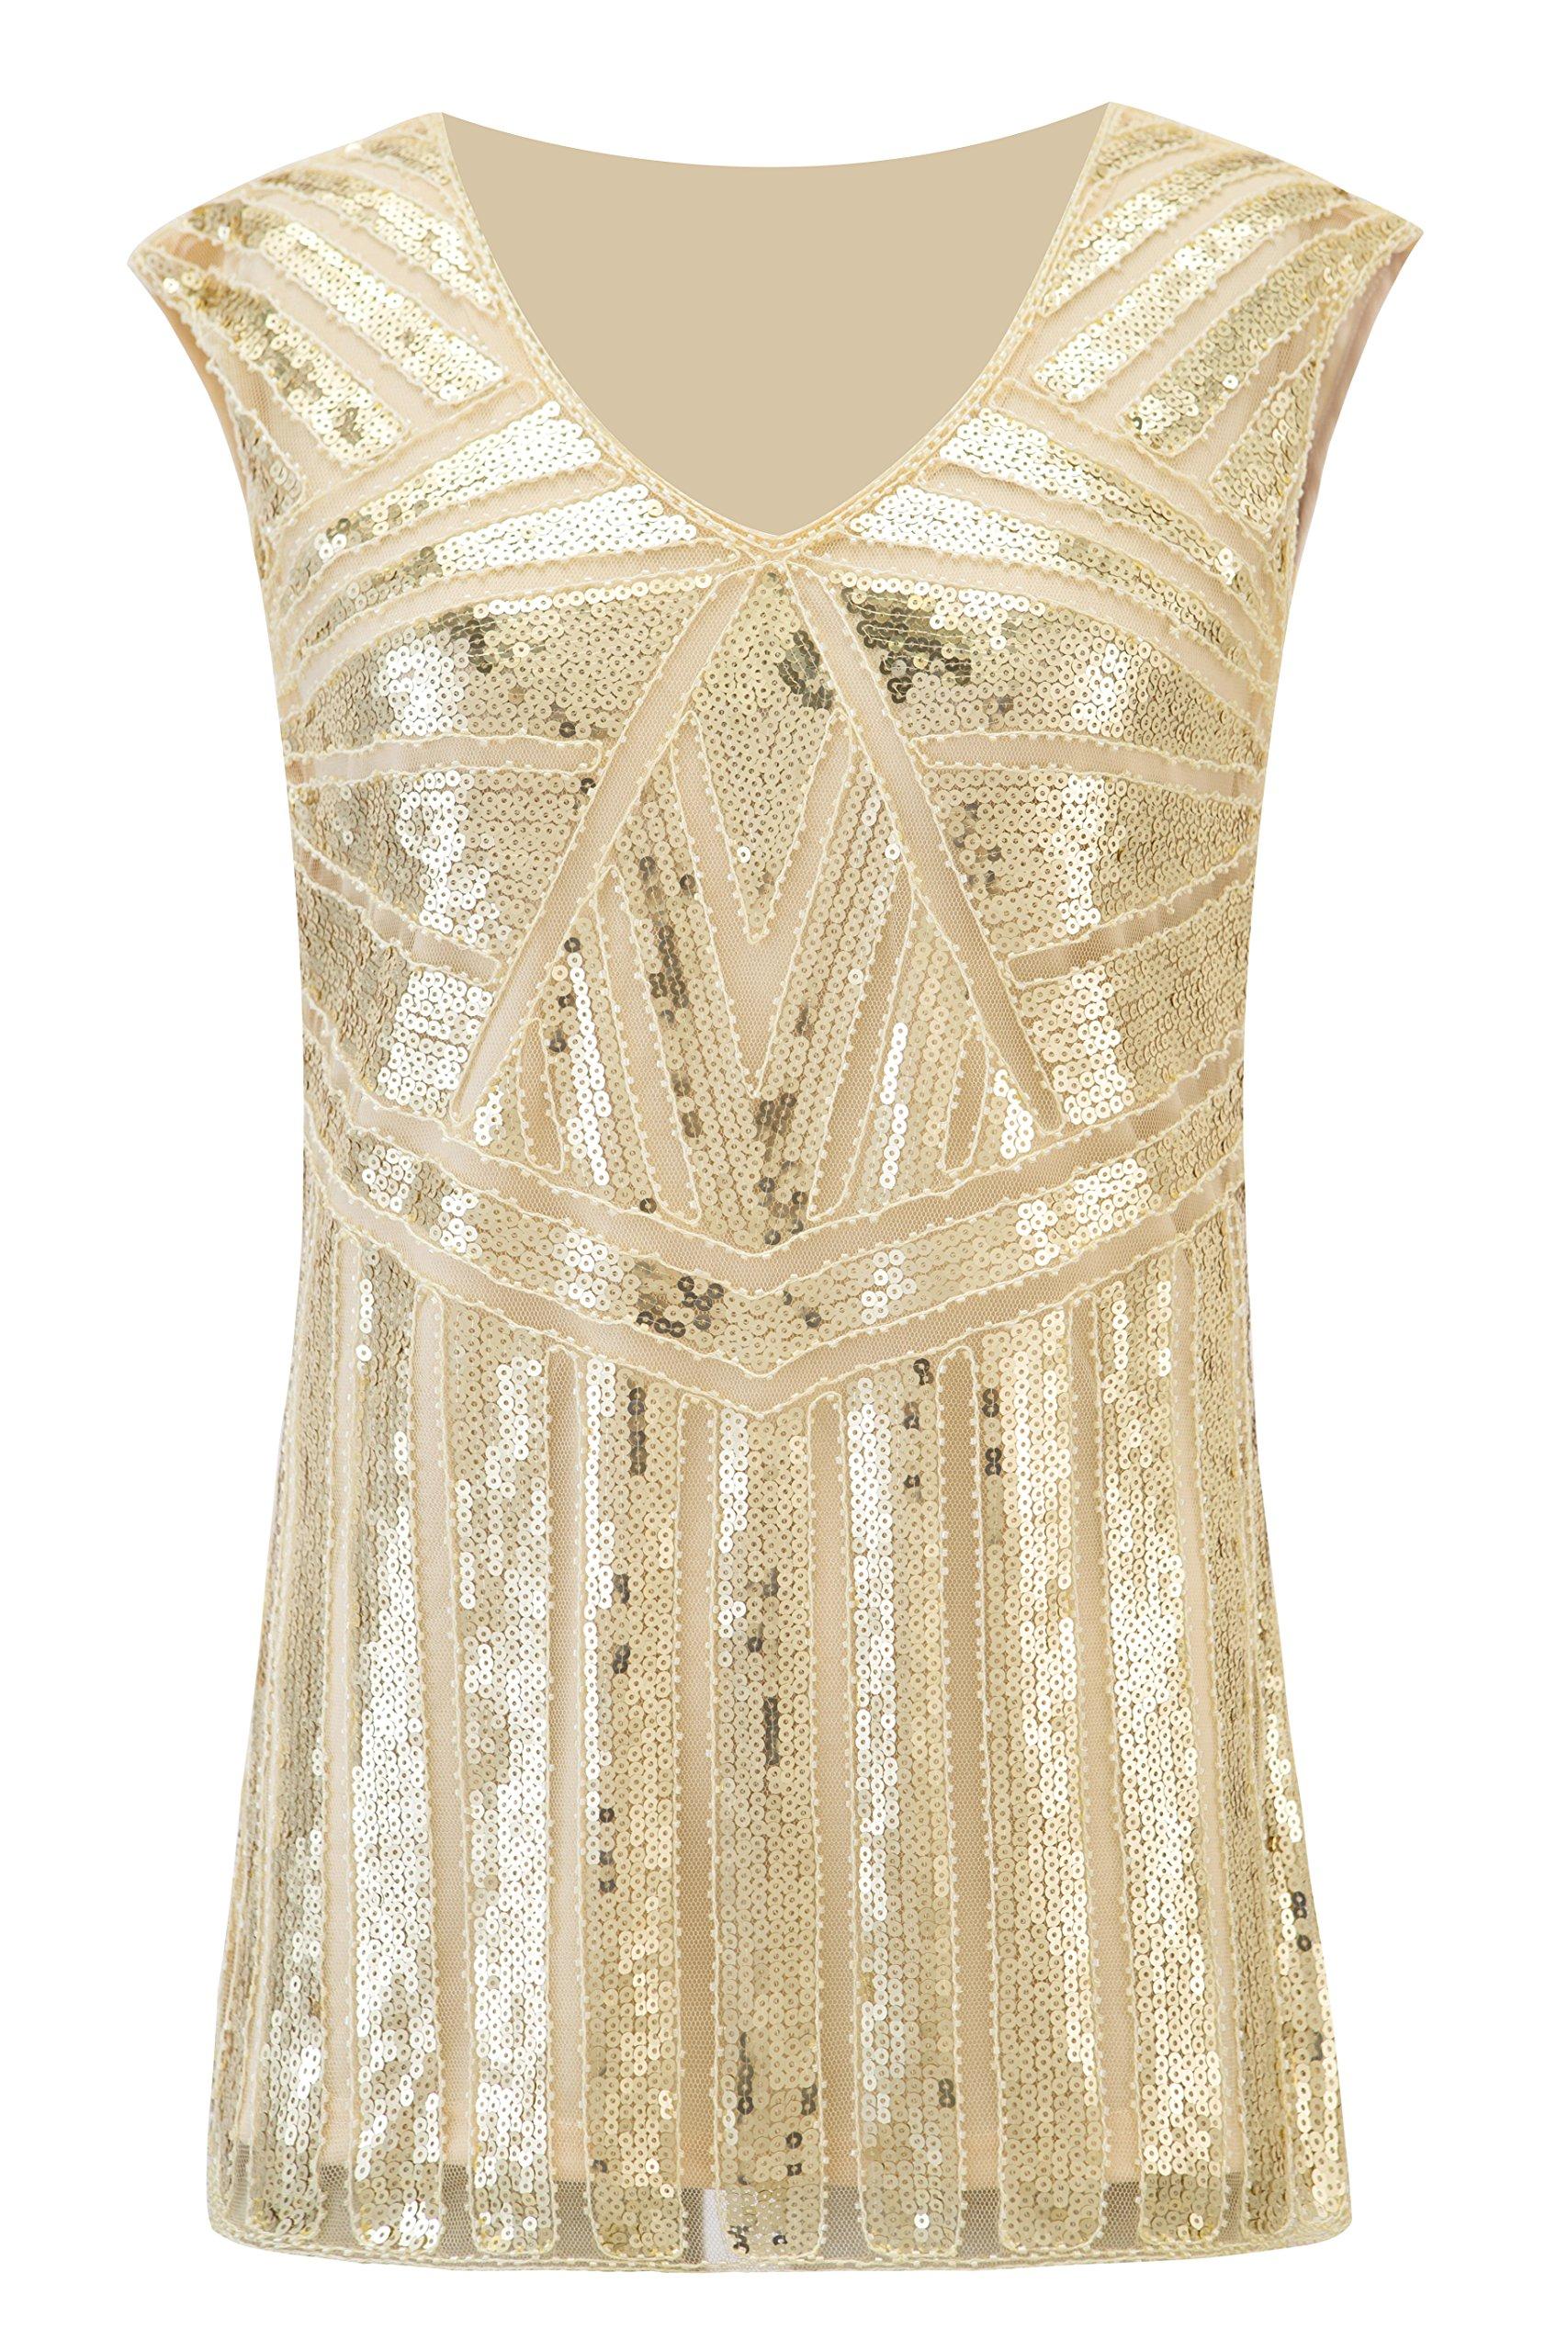 6b3d2c7bbf5ee4 Galleon - Metme Women Vintage V Neck Slight Loose Flashy Sequin Sparkly  Vest Tops Tank Tops Champagne